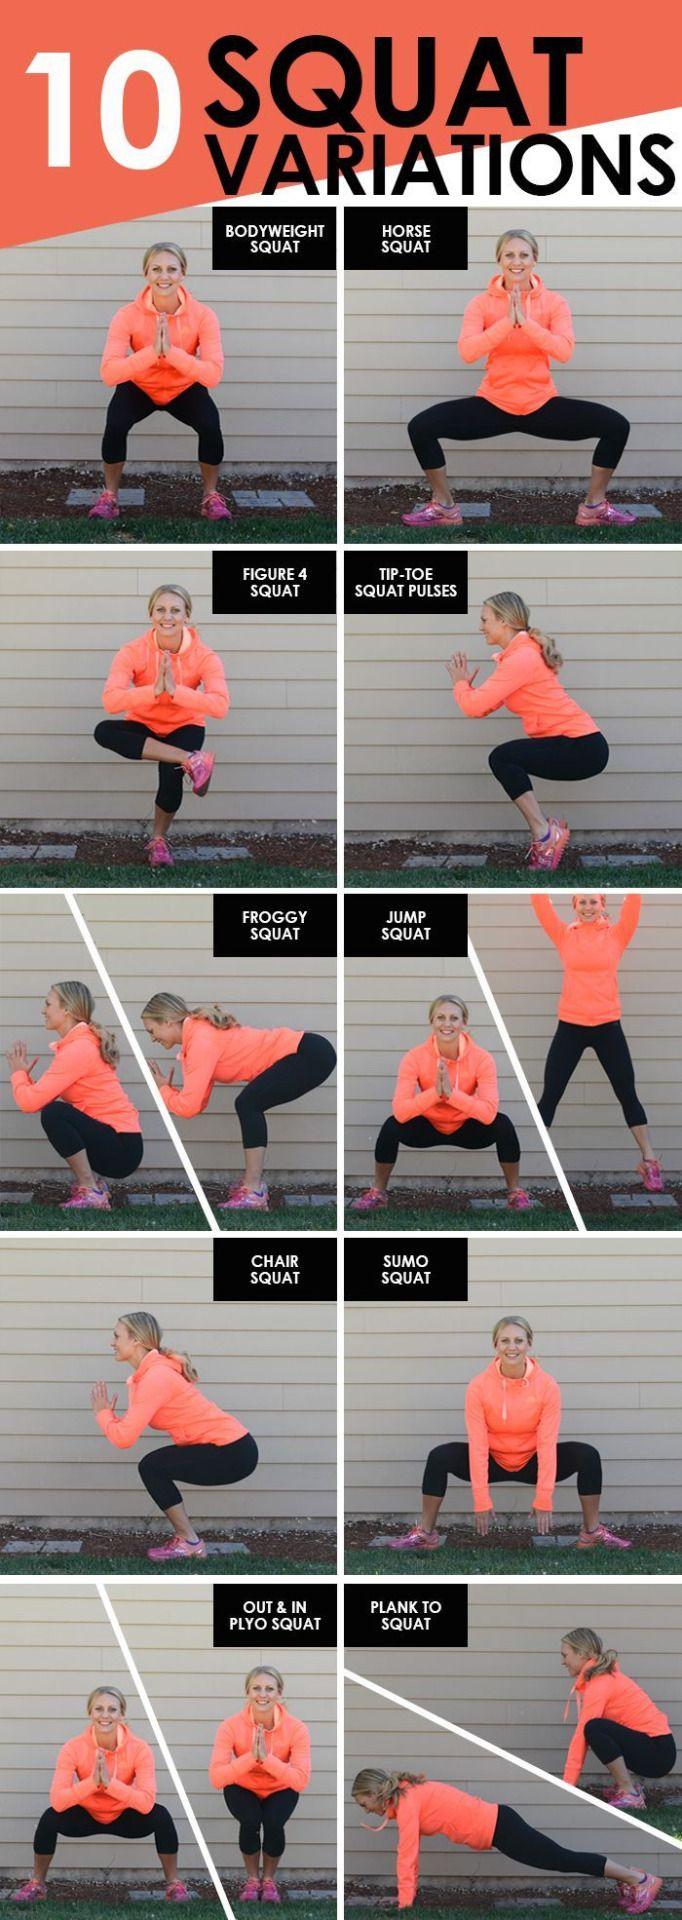 10 Squat Variations